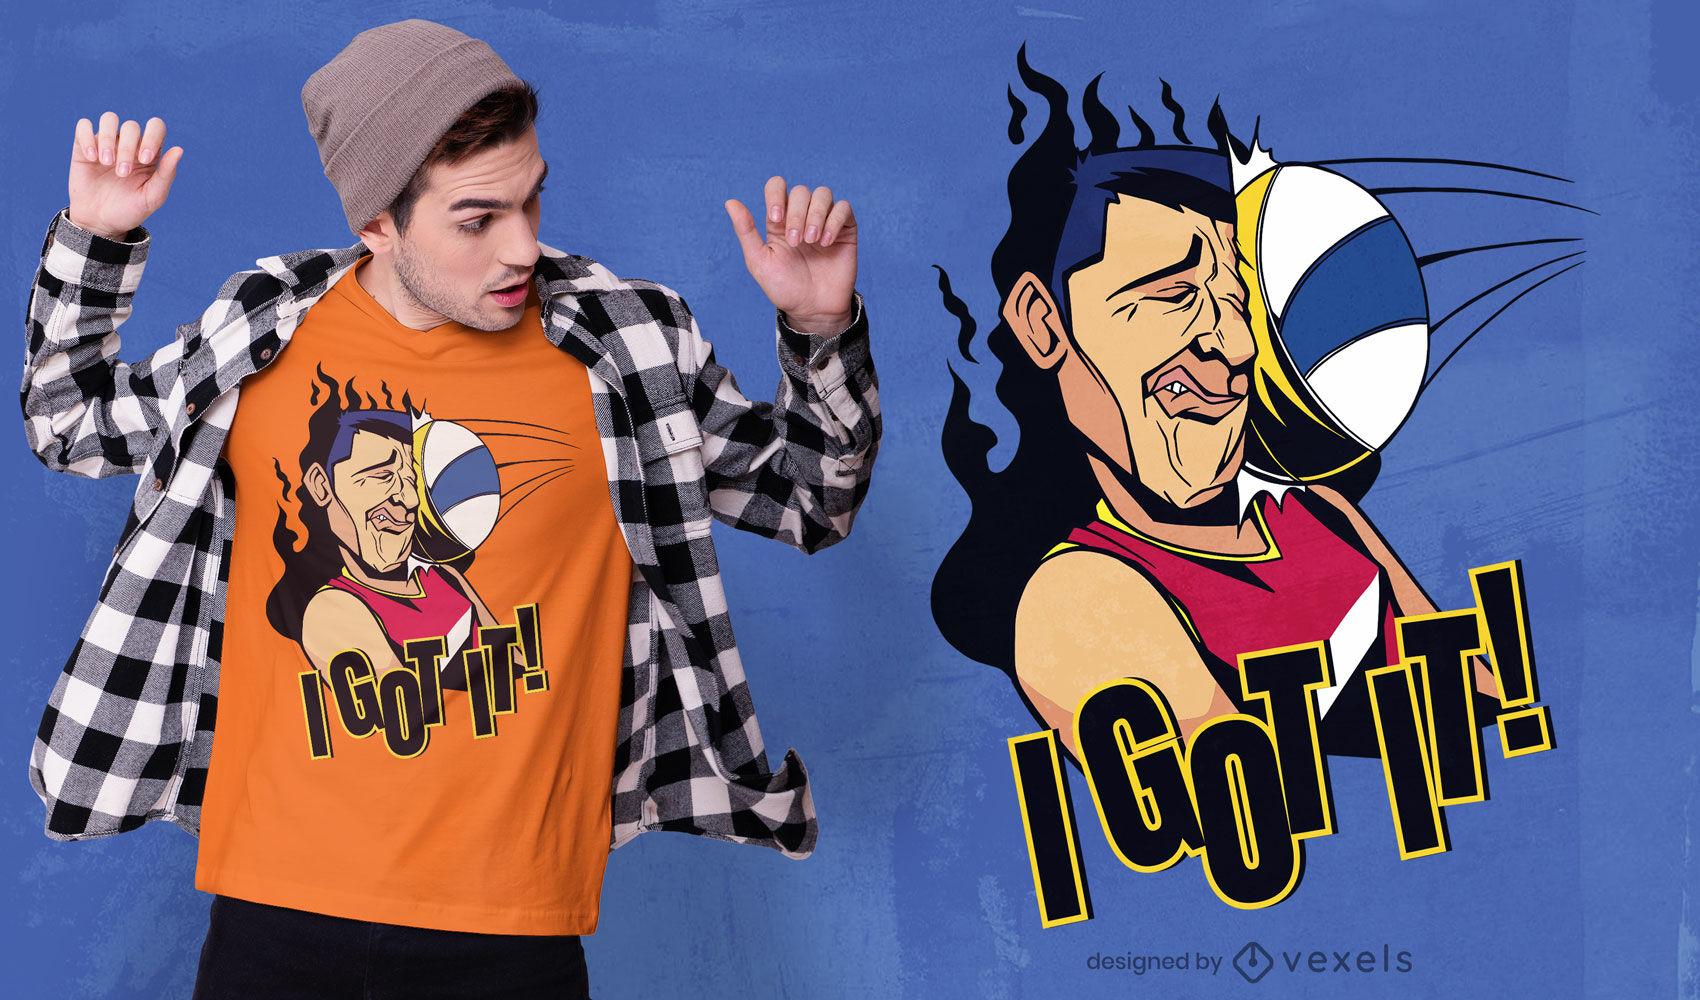 Volleyball player funny cartoon t-shirt design